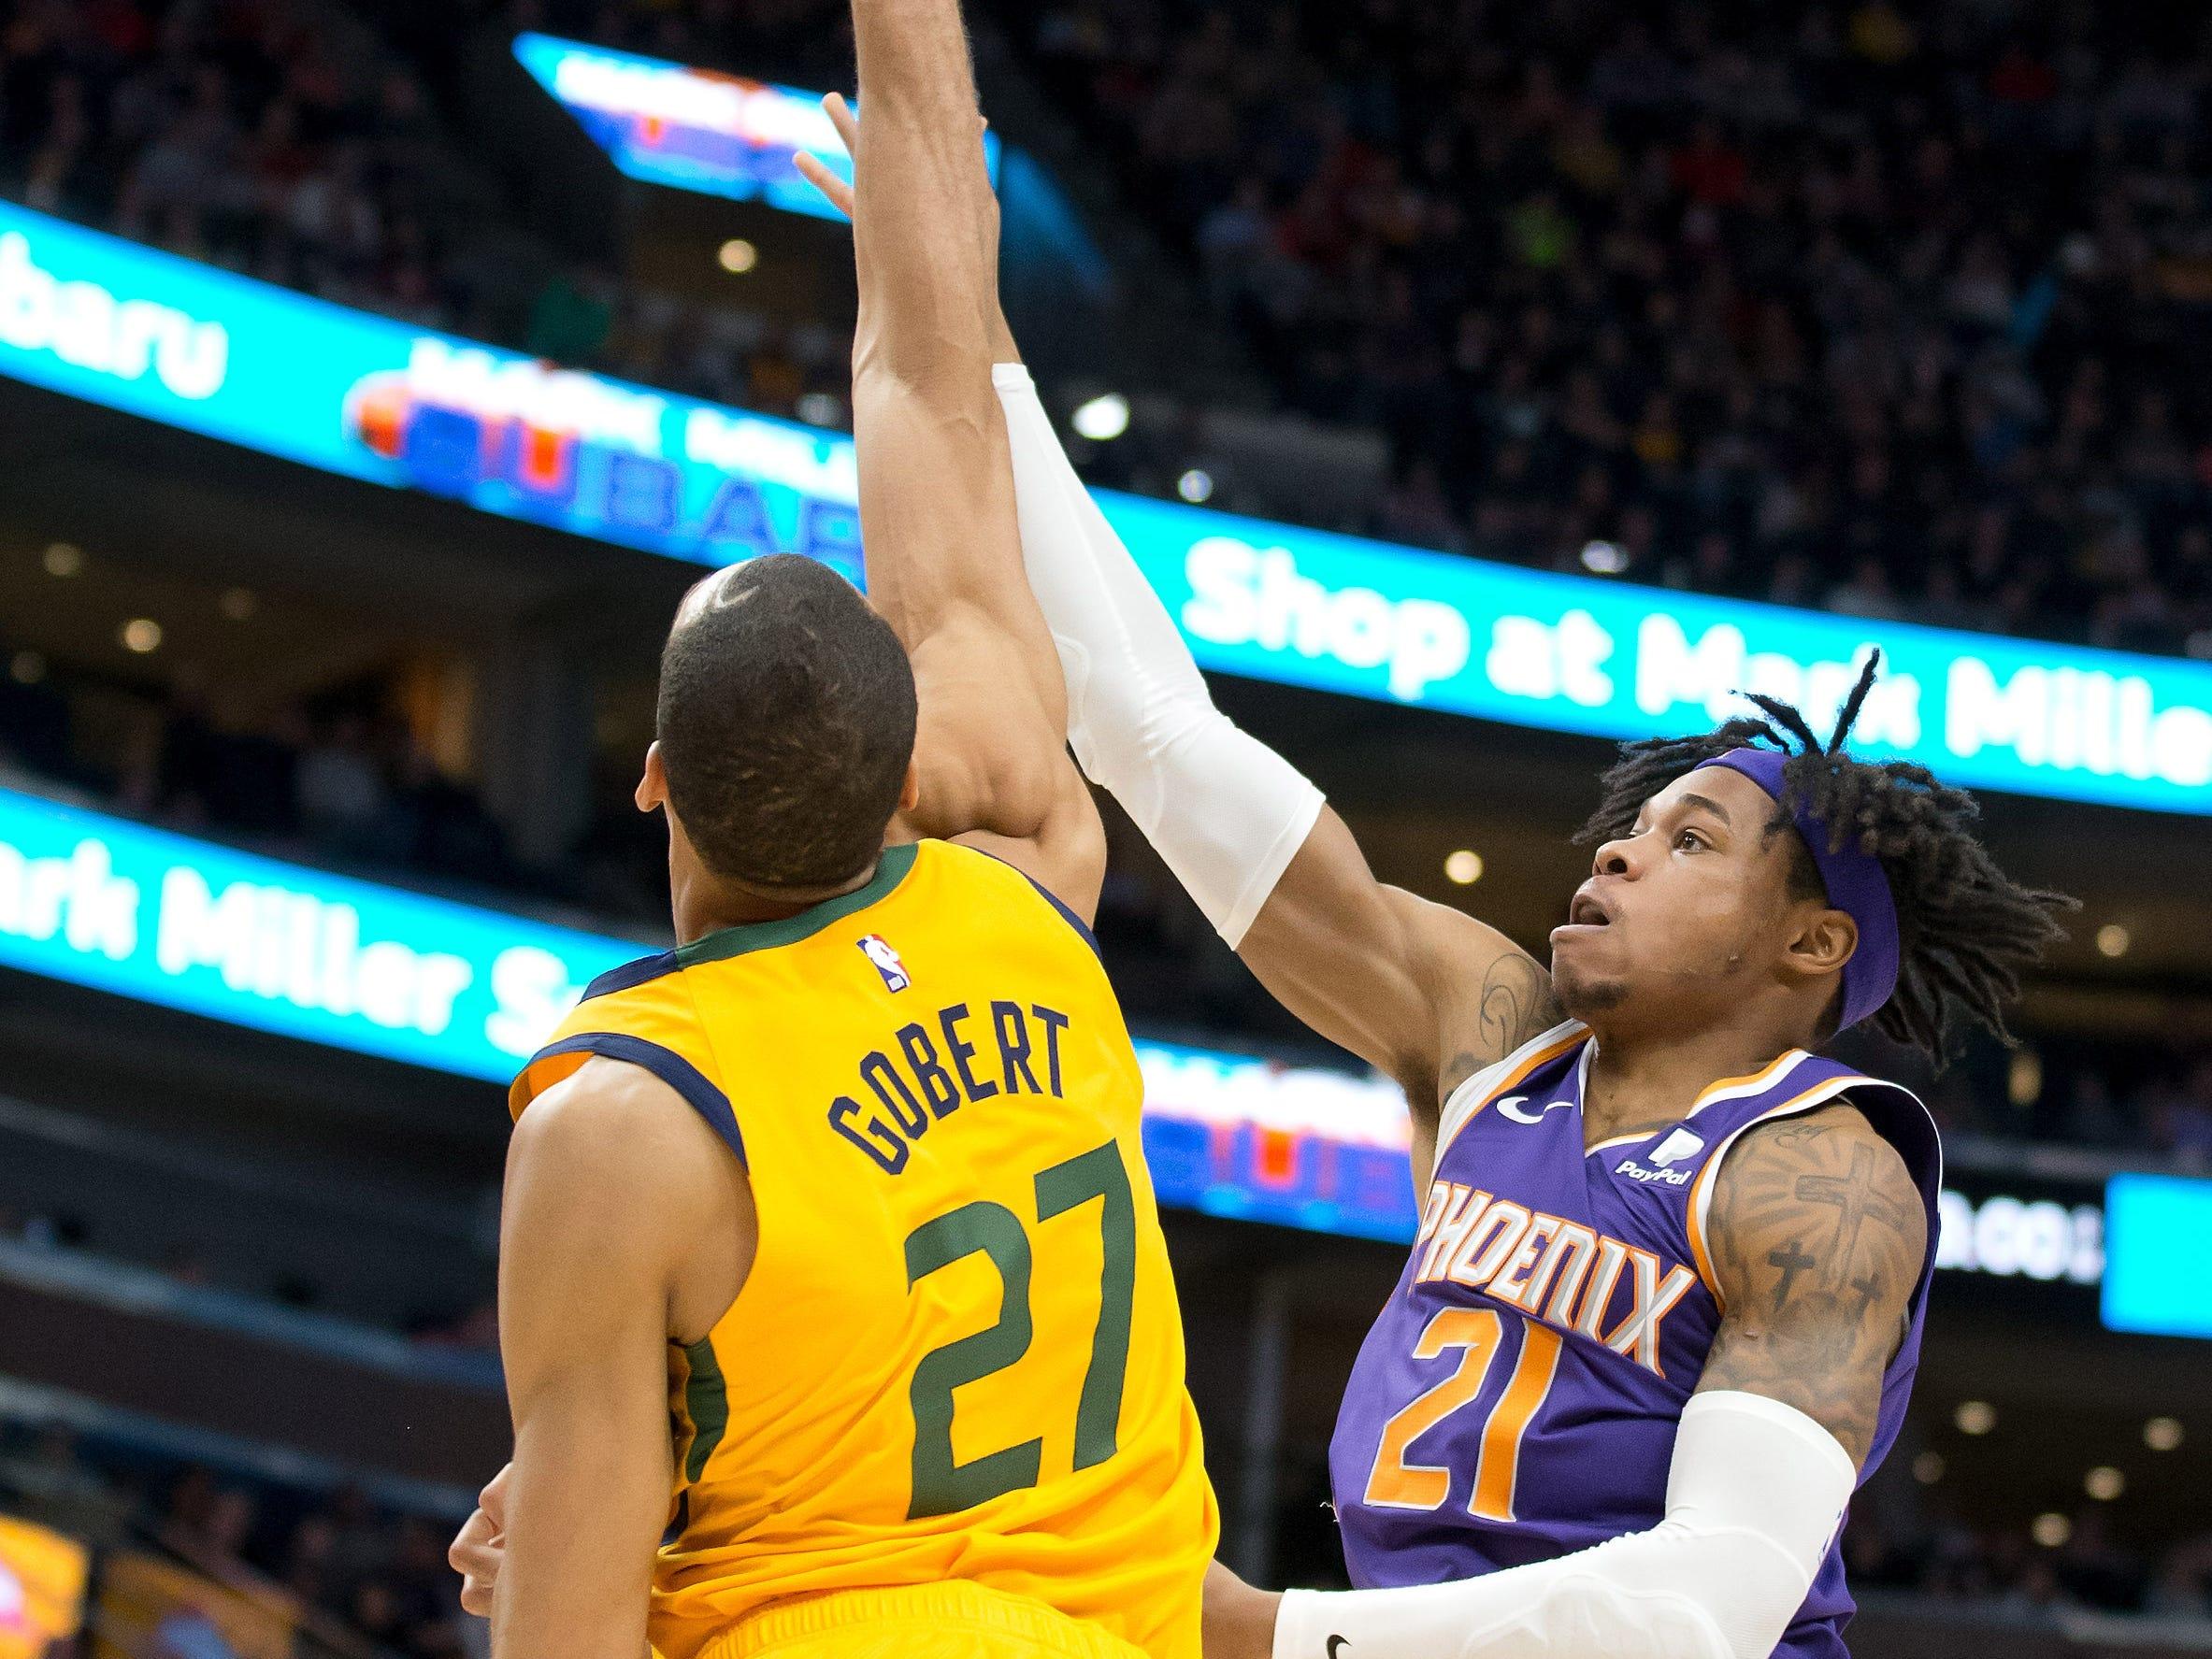 Feb 6, 2019; Salt Lake City, UT, USA; Utah Jazz center Rudy Gobert (27) blocks the shot of Phoenix Suns forward Richaun Holmes (21) during the first half at Vivint Smart Home Arena. Mandatory Credit: Russ Isabella-USA TODAY Sports